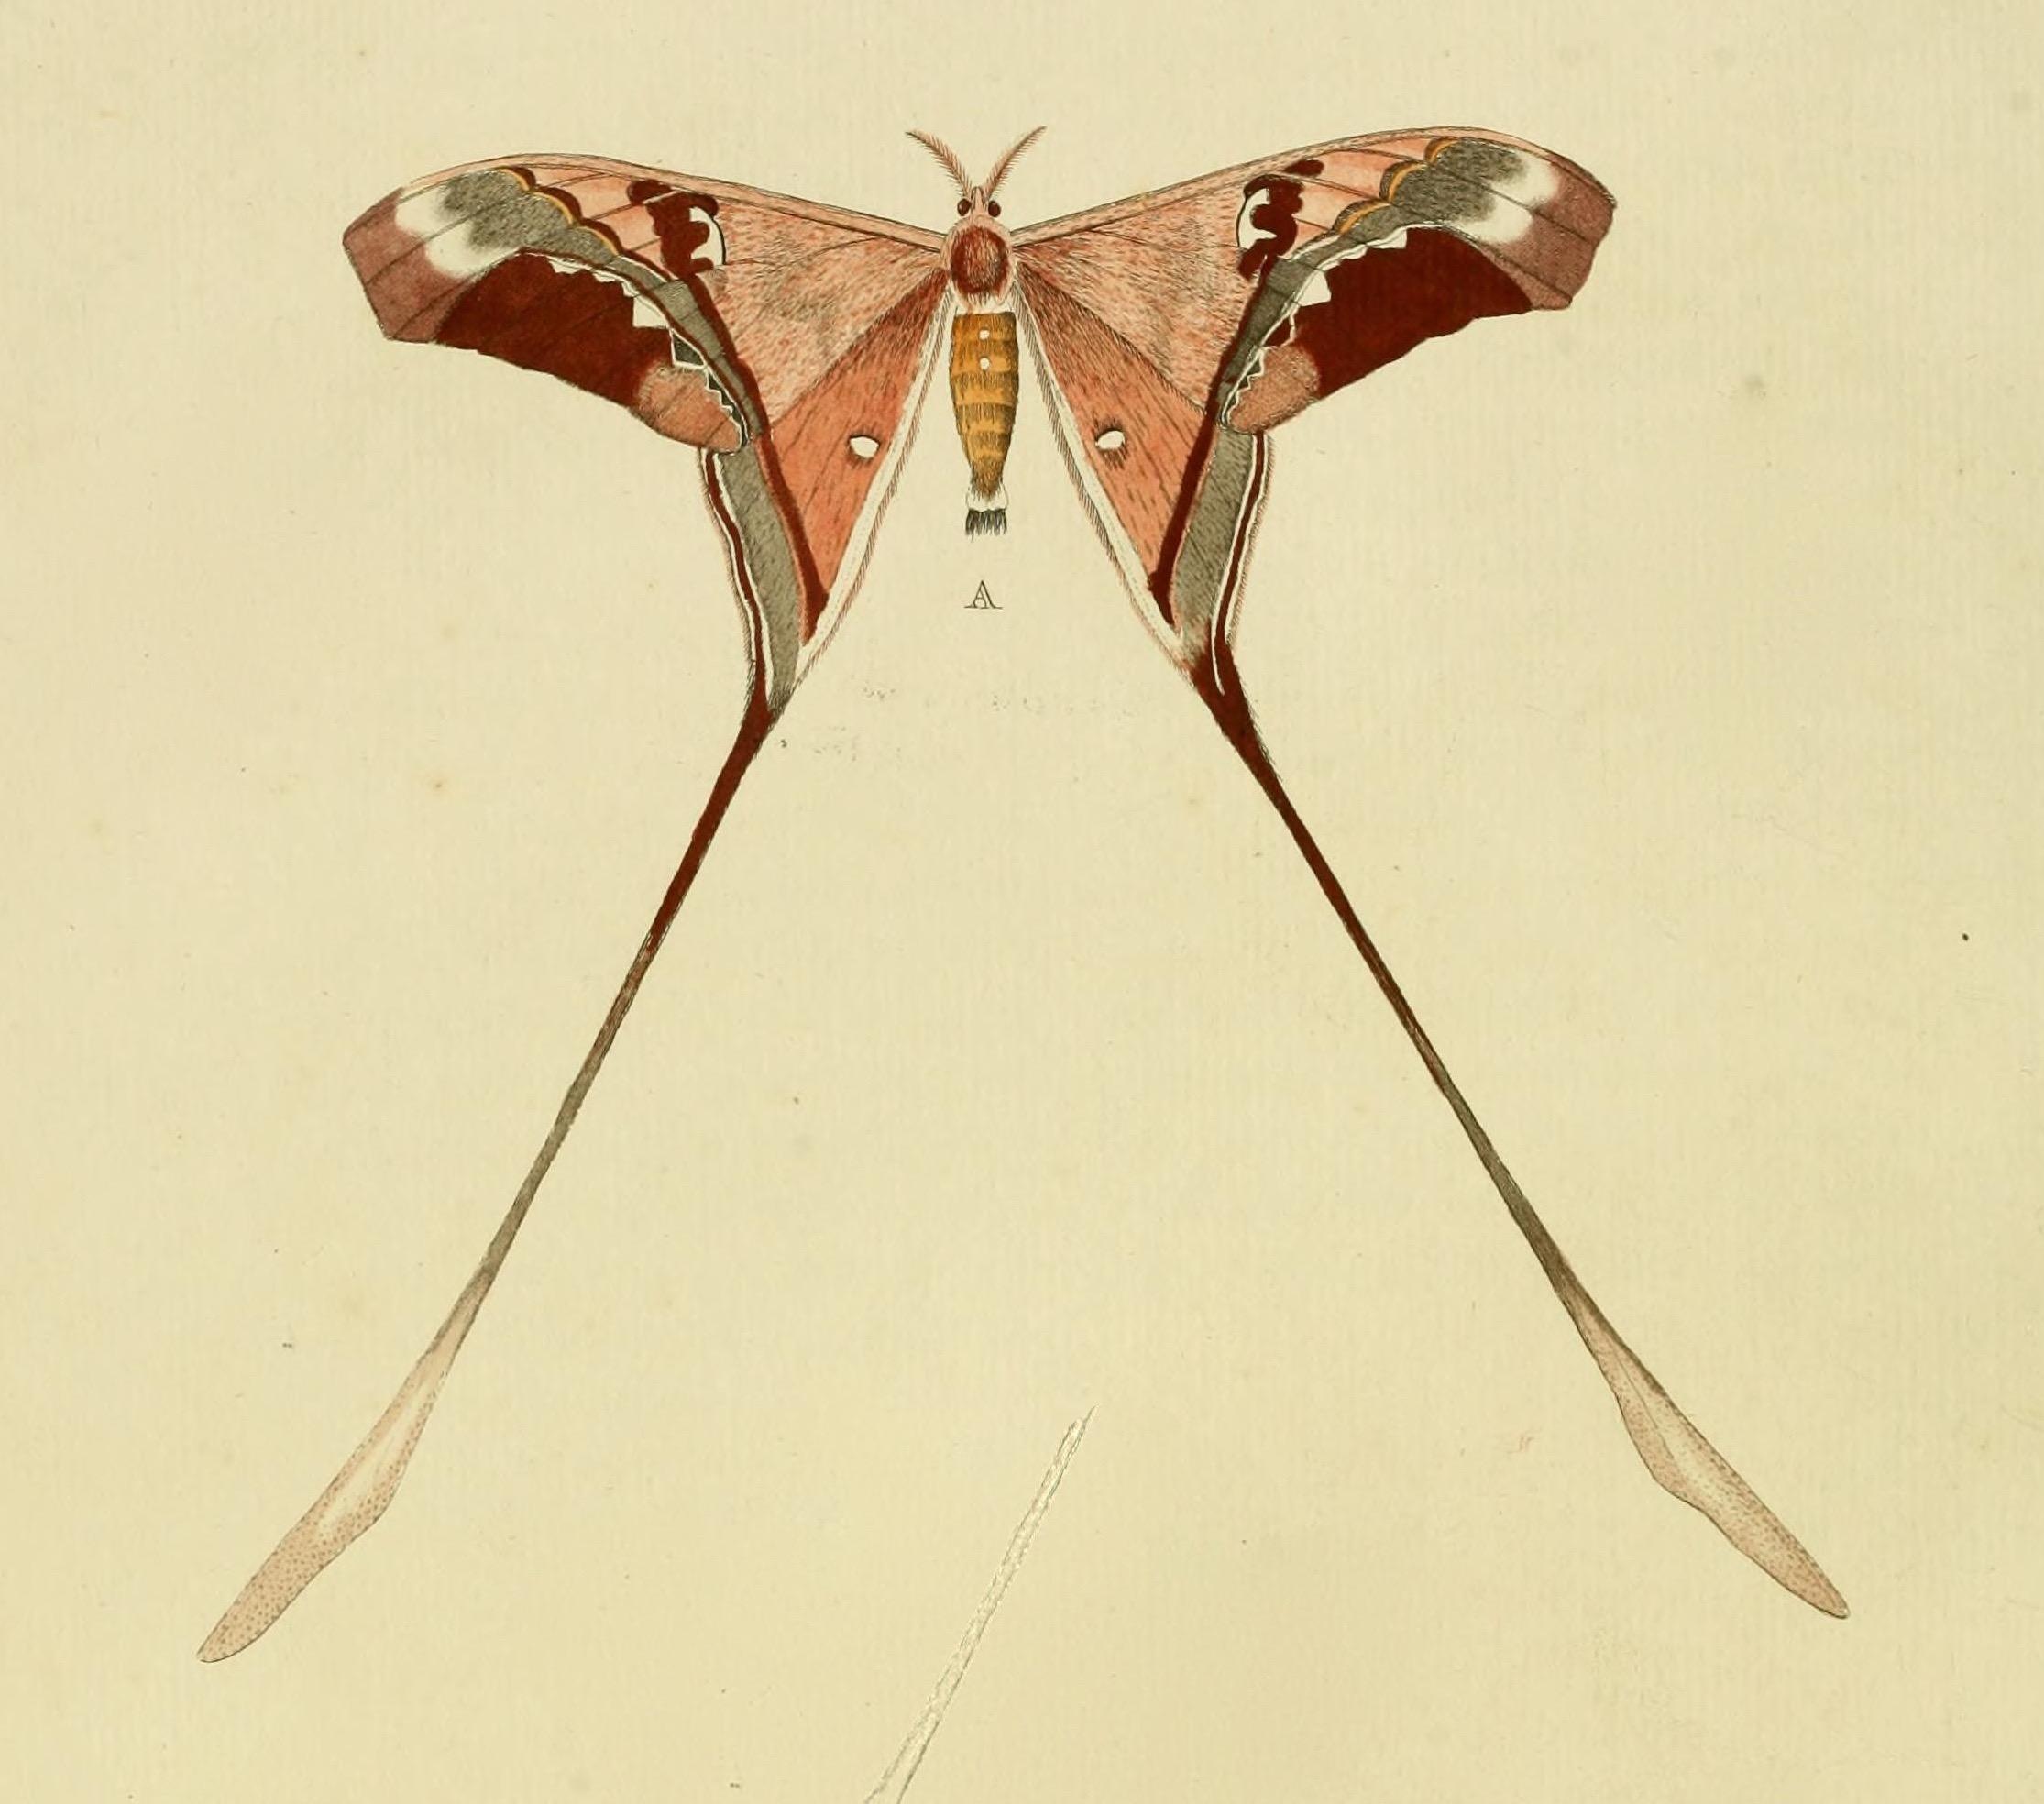 Stettner's Silk Moth Copiopteryx semiramis